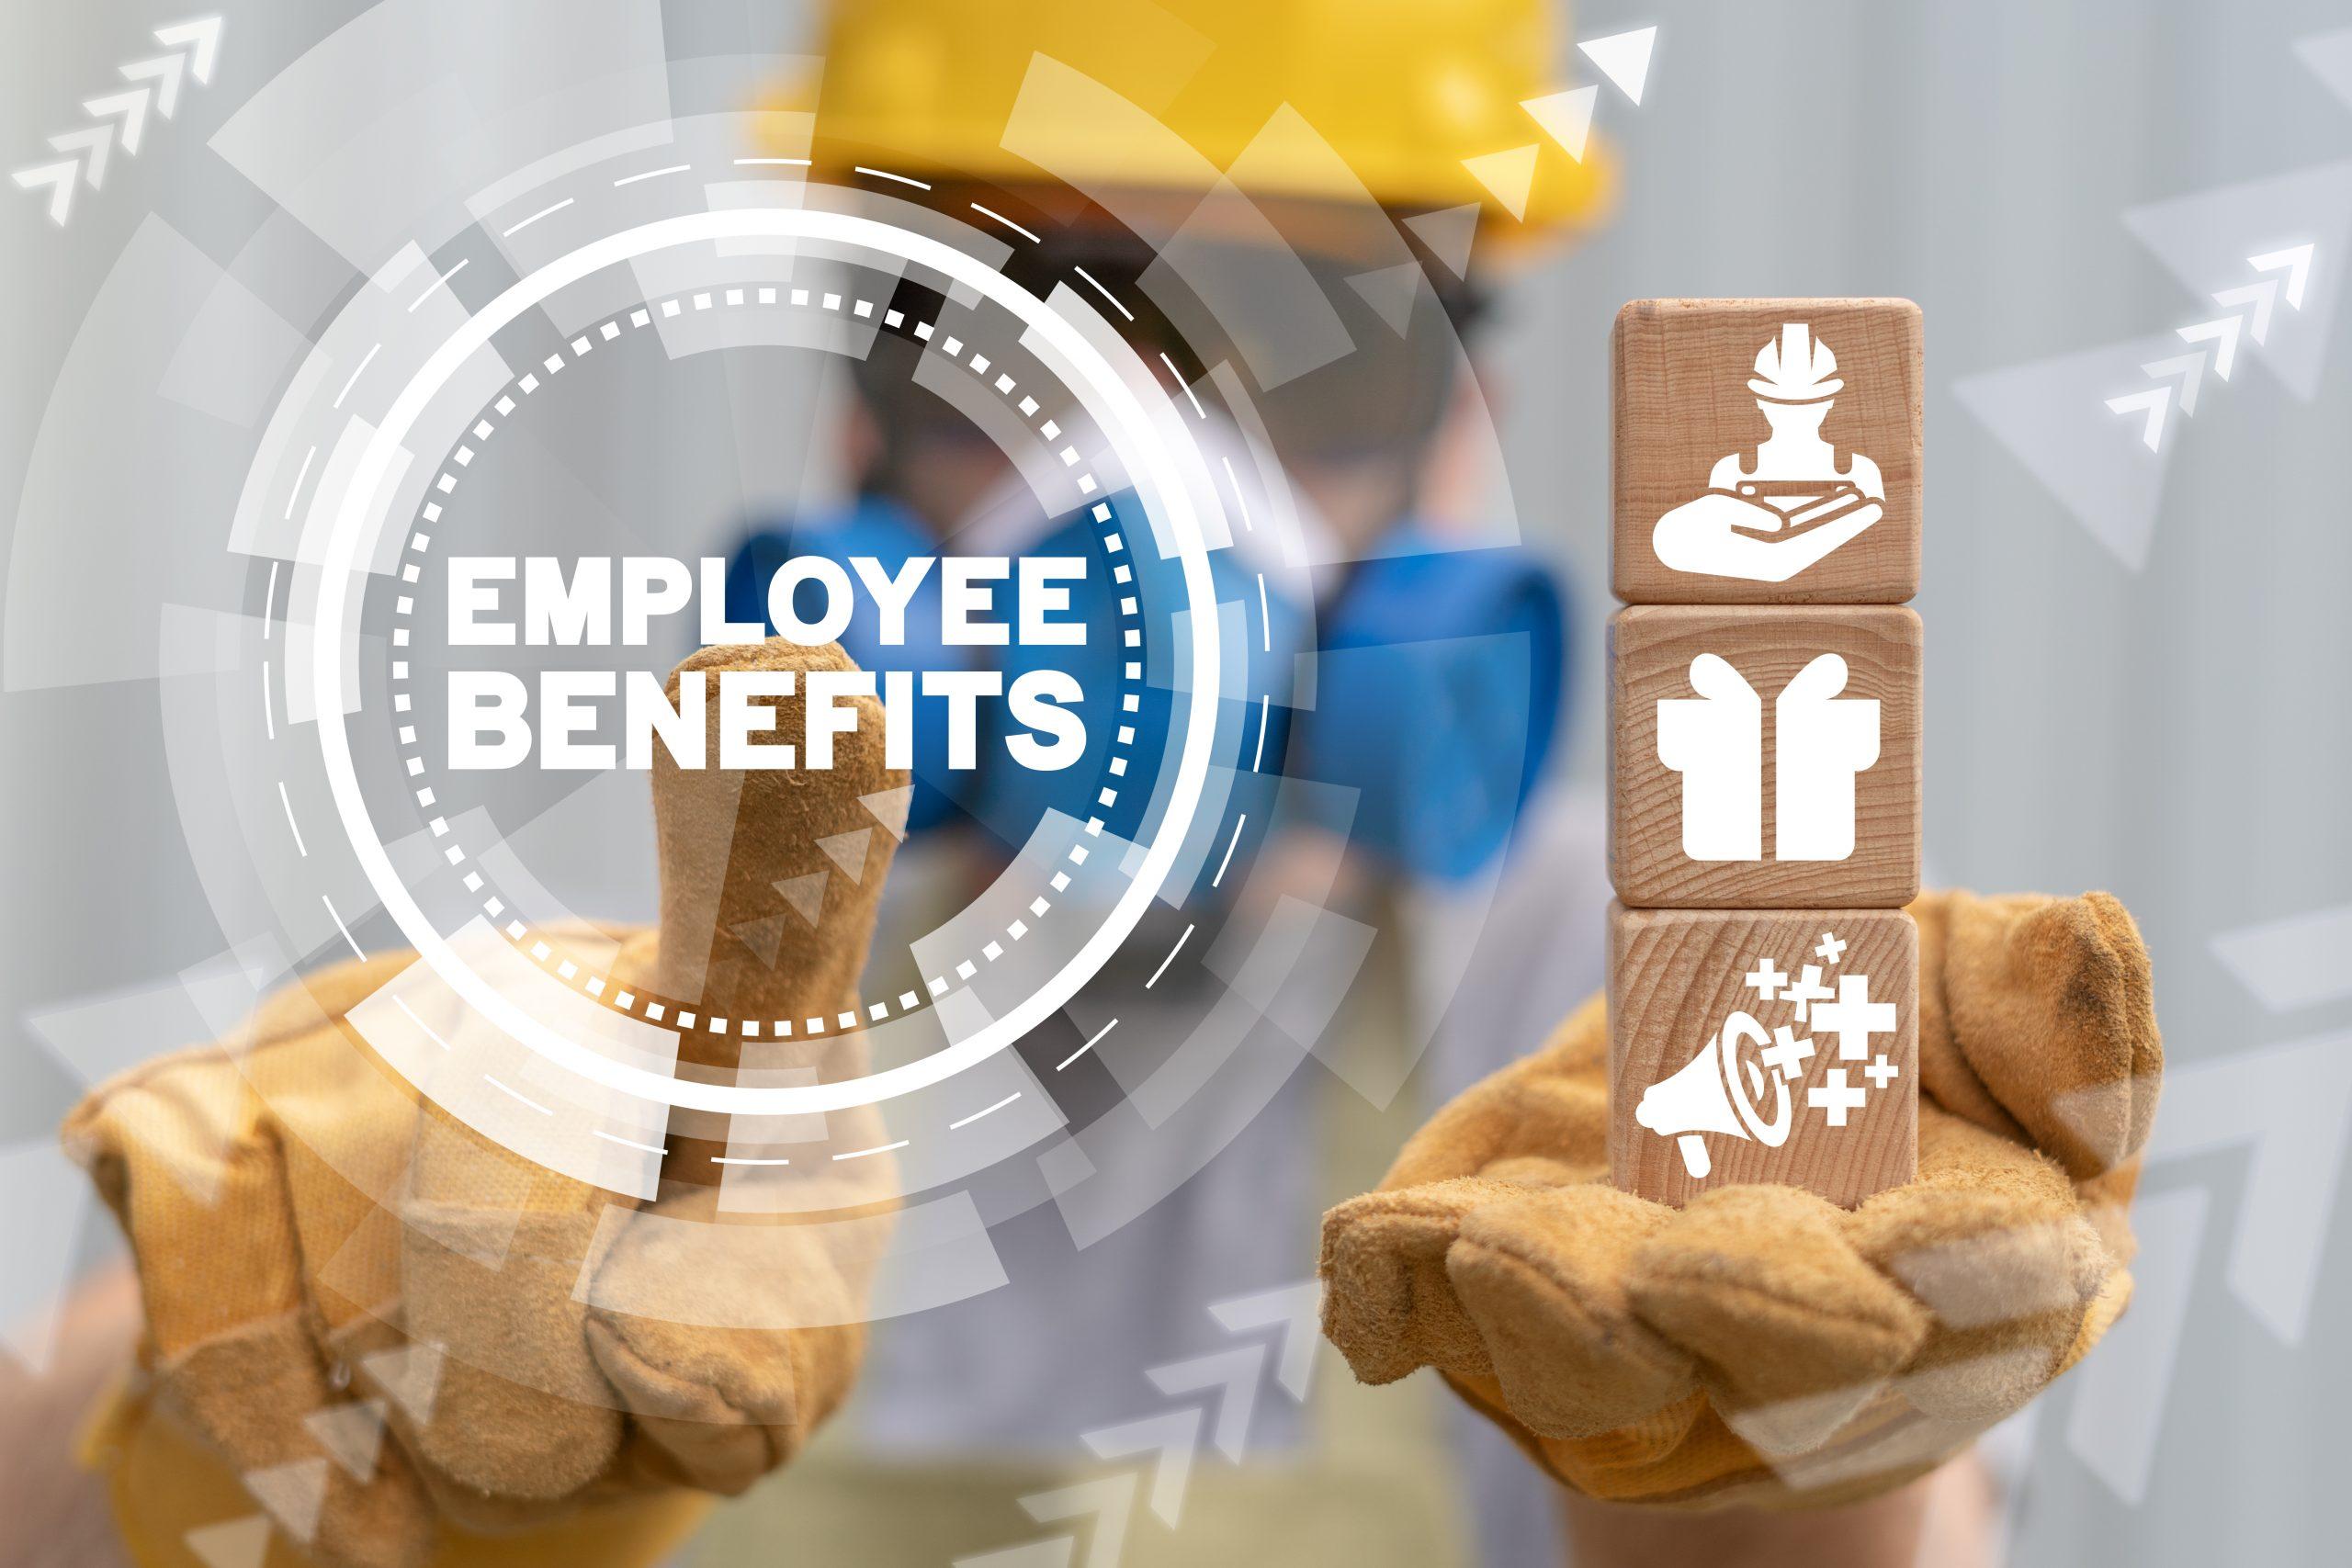 HSA employee benefits